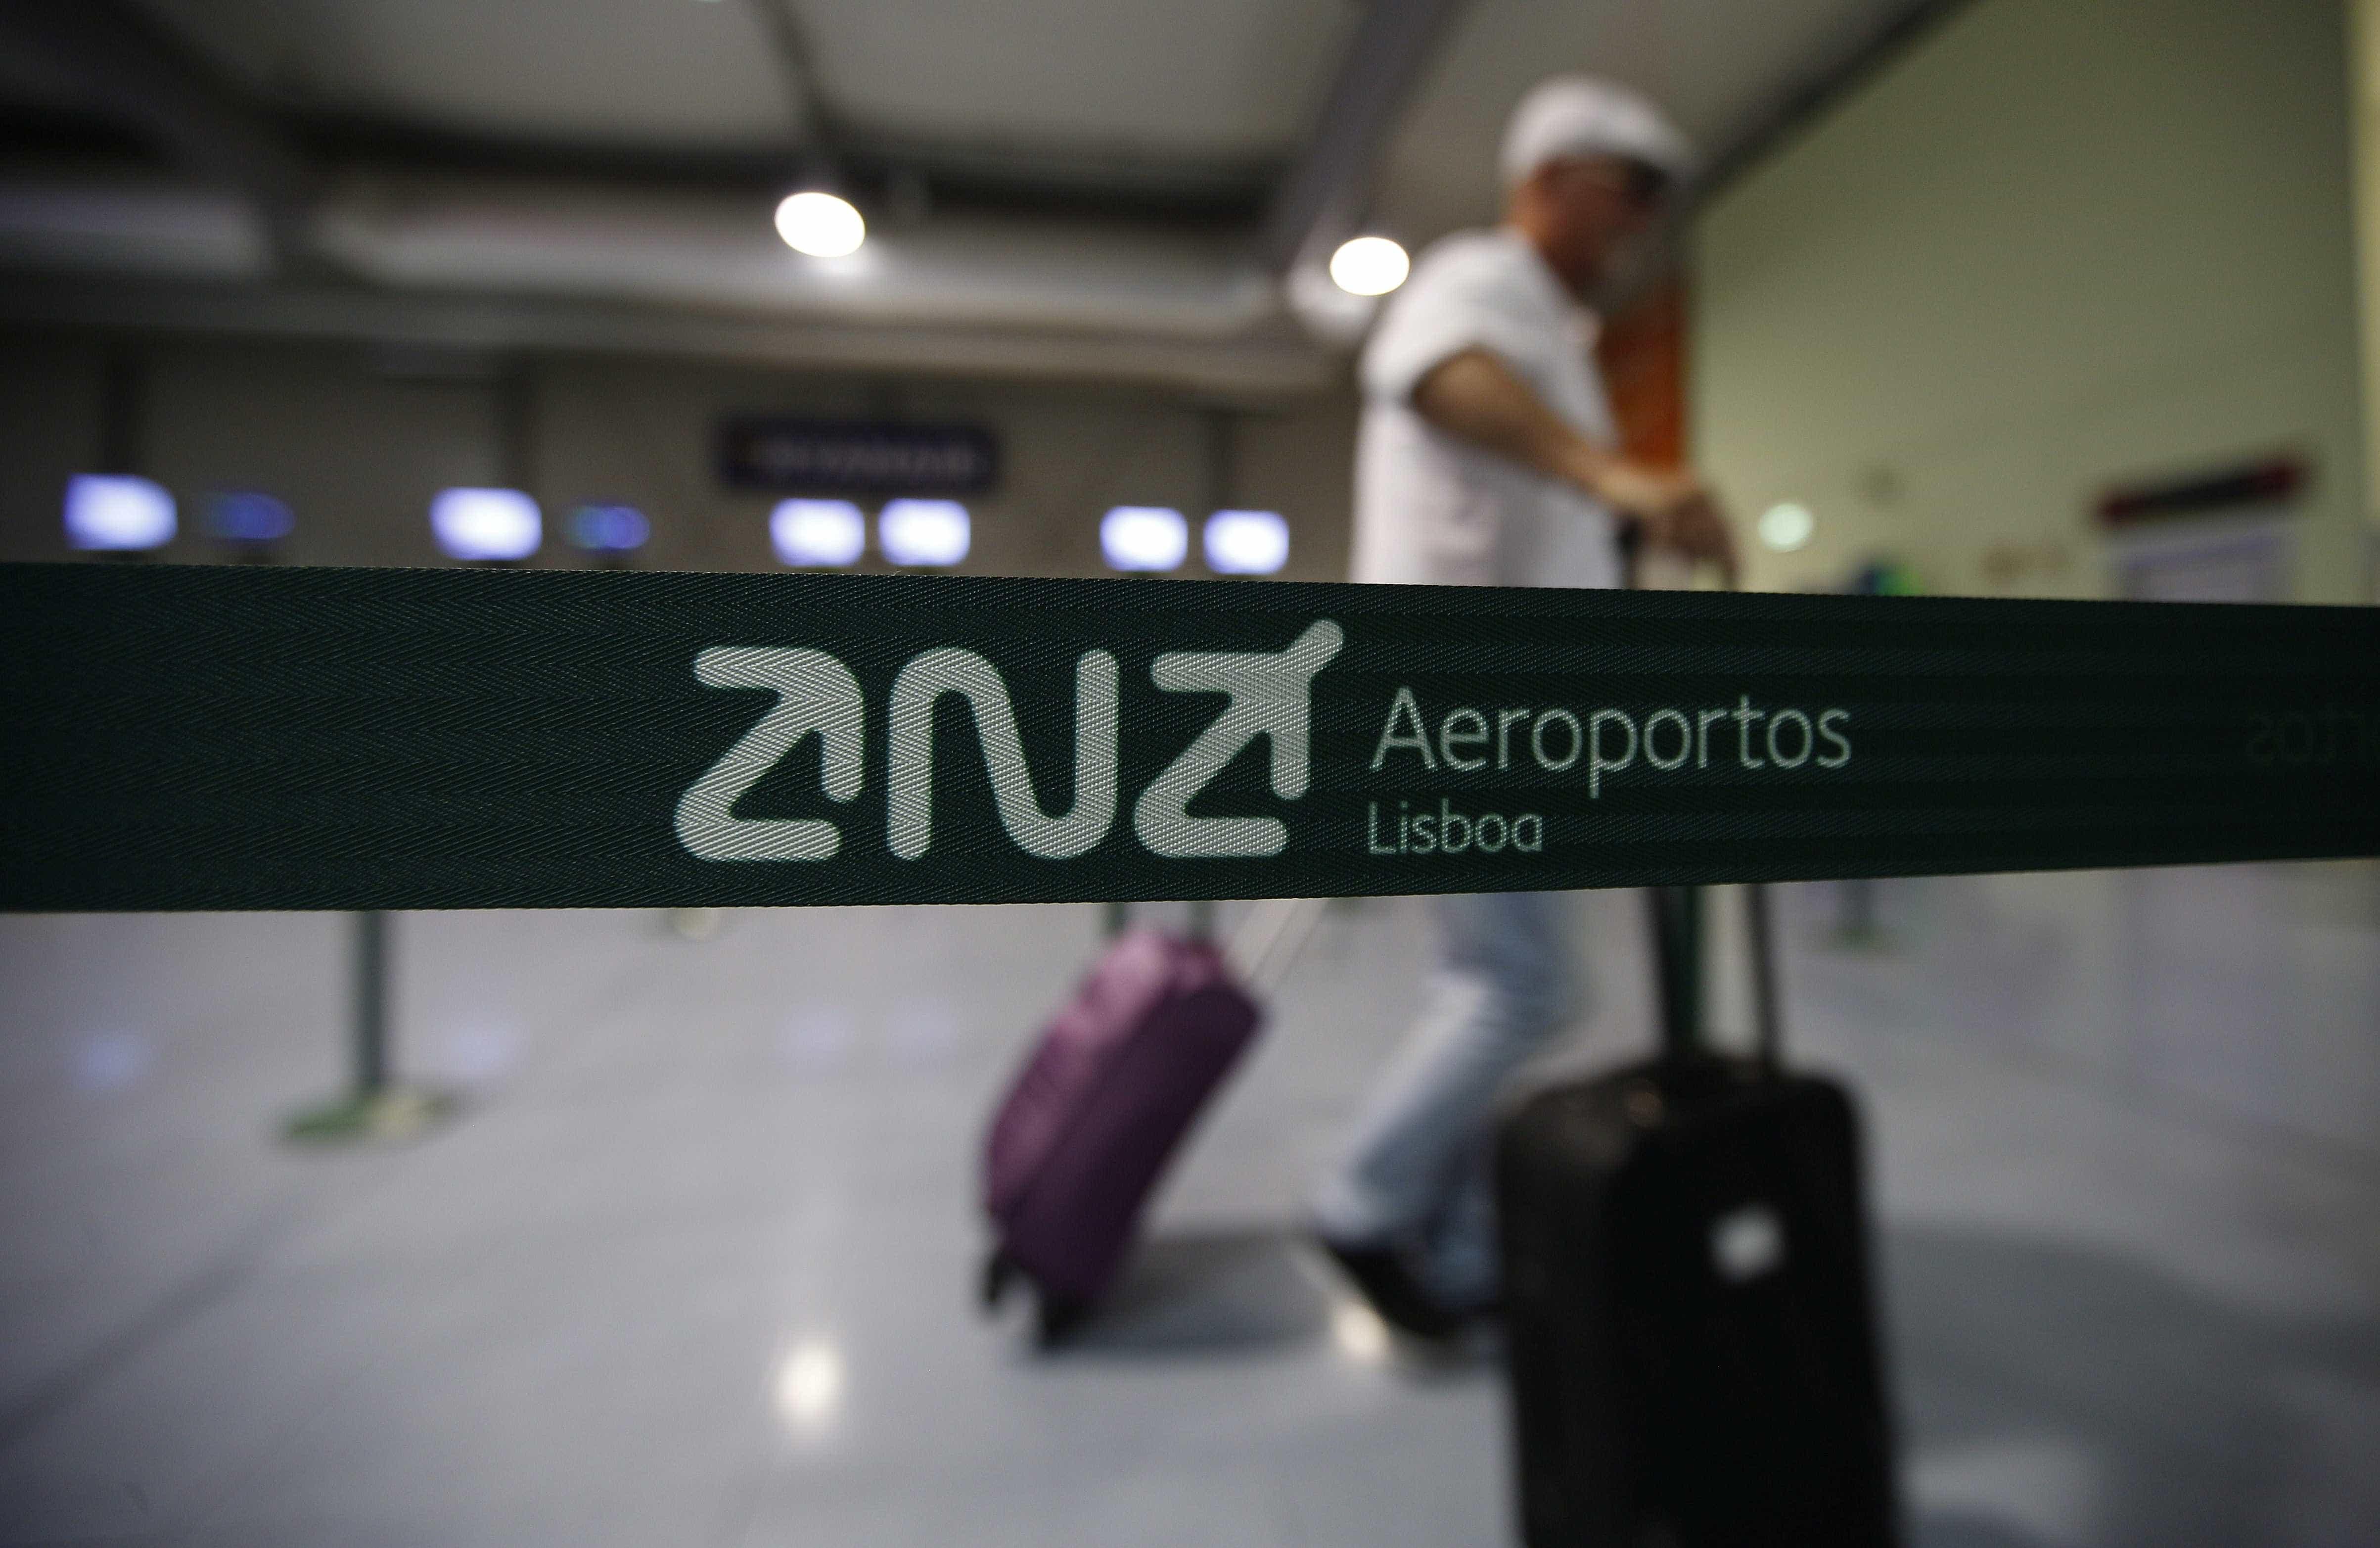 Quatro detidos no aeroporto de Lisboa por furtos a passageiros